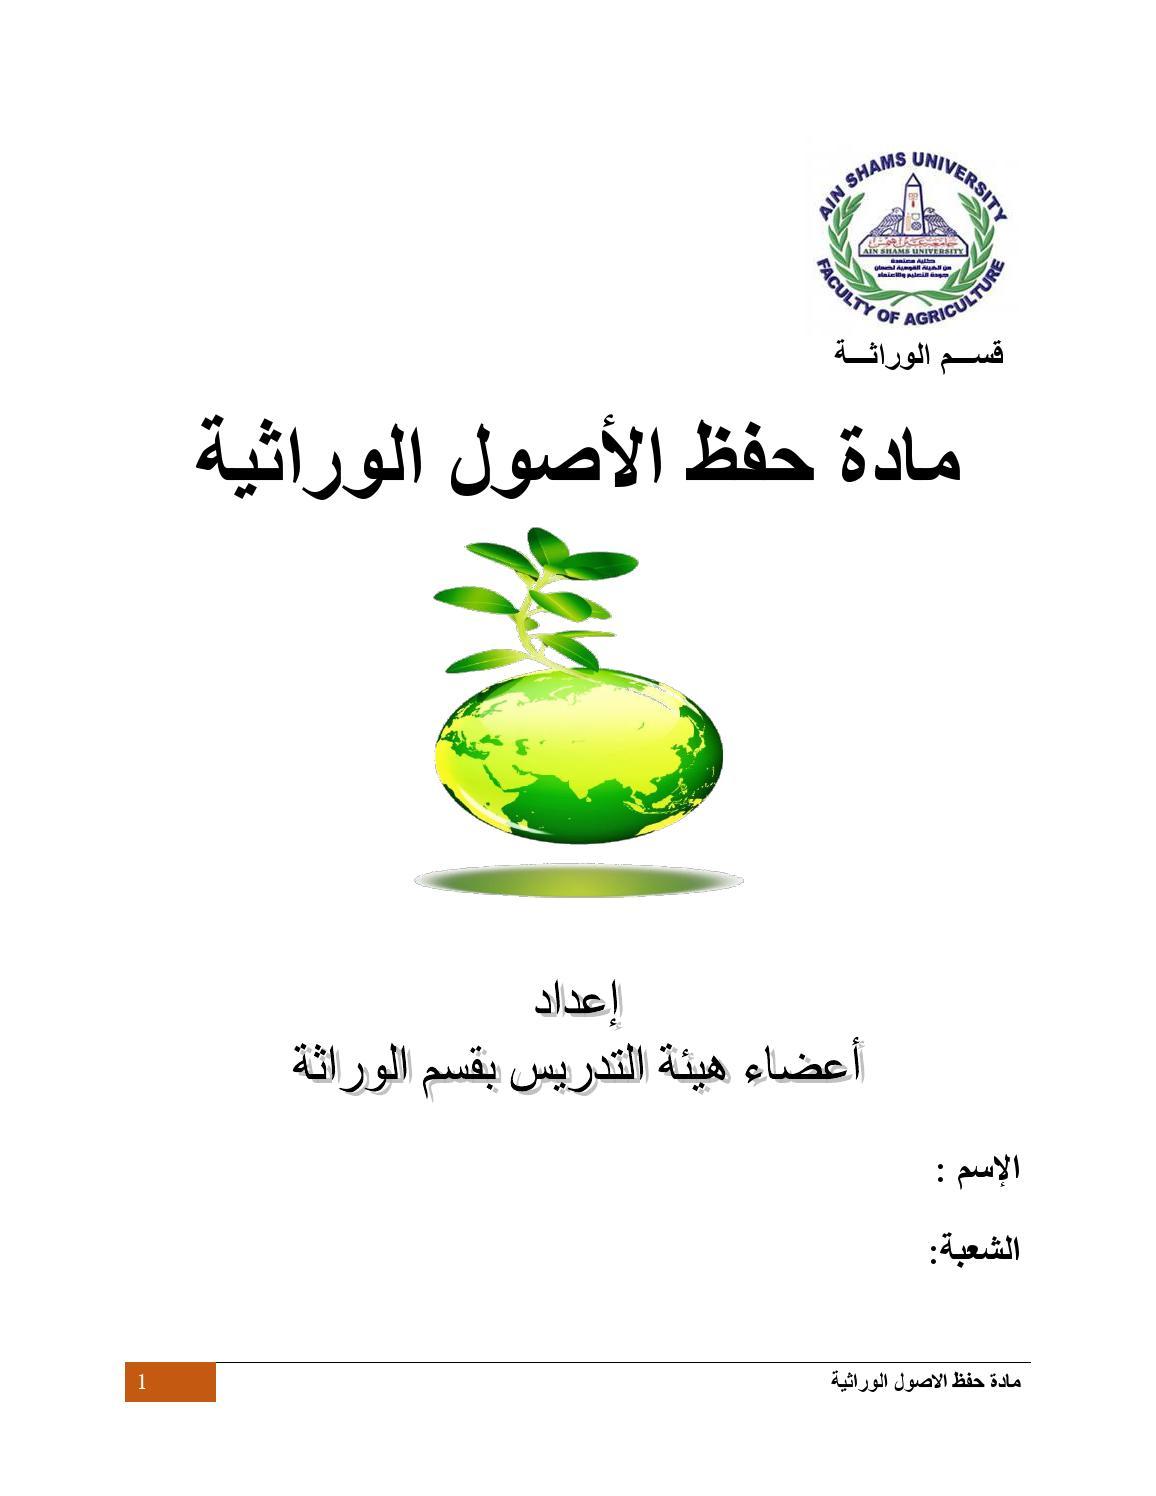 منهج حفظ الاصول الوراثية فبراير 2016 By Mona Moghazee Issuu